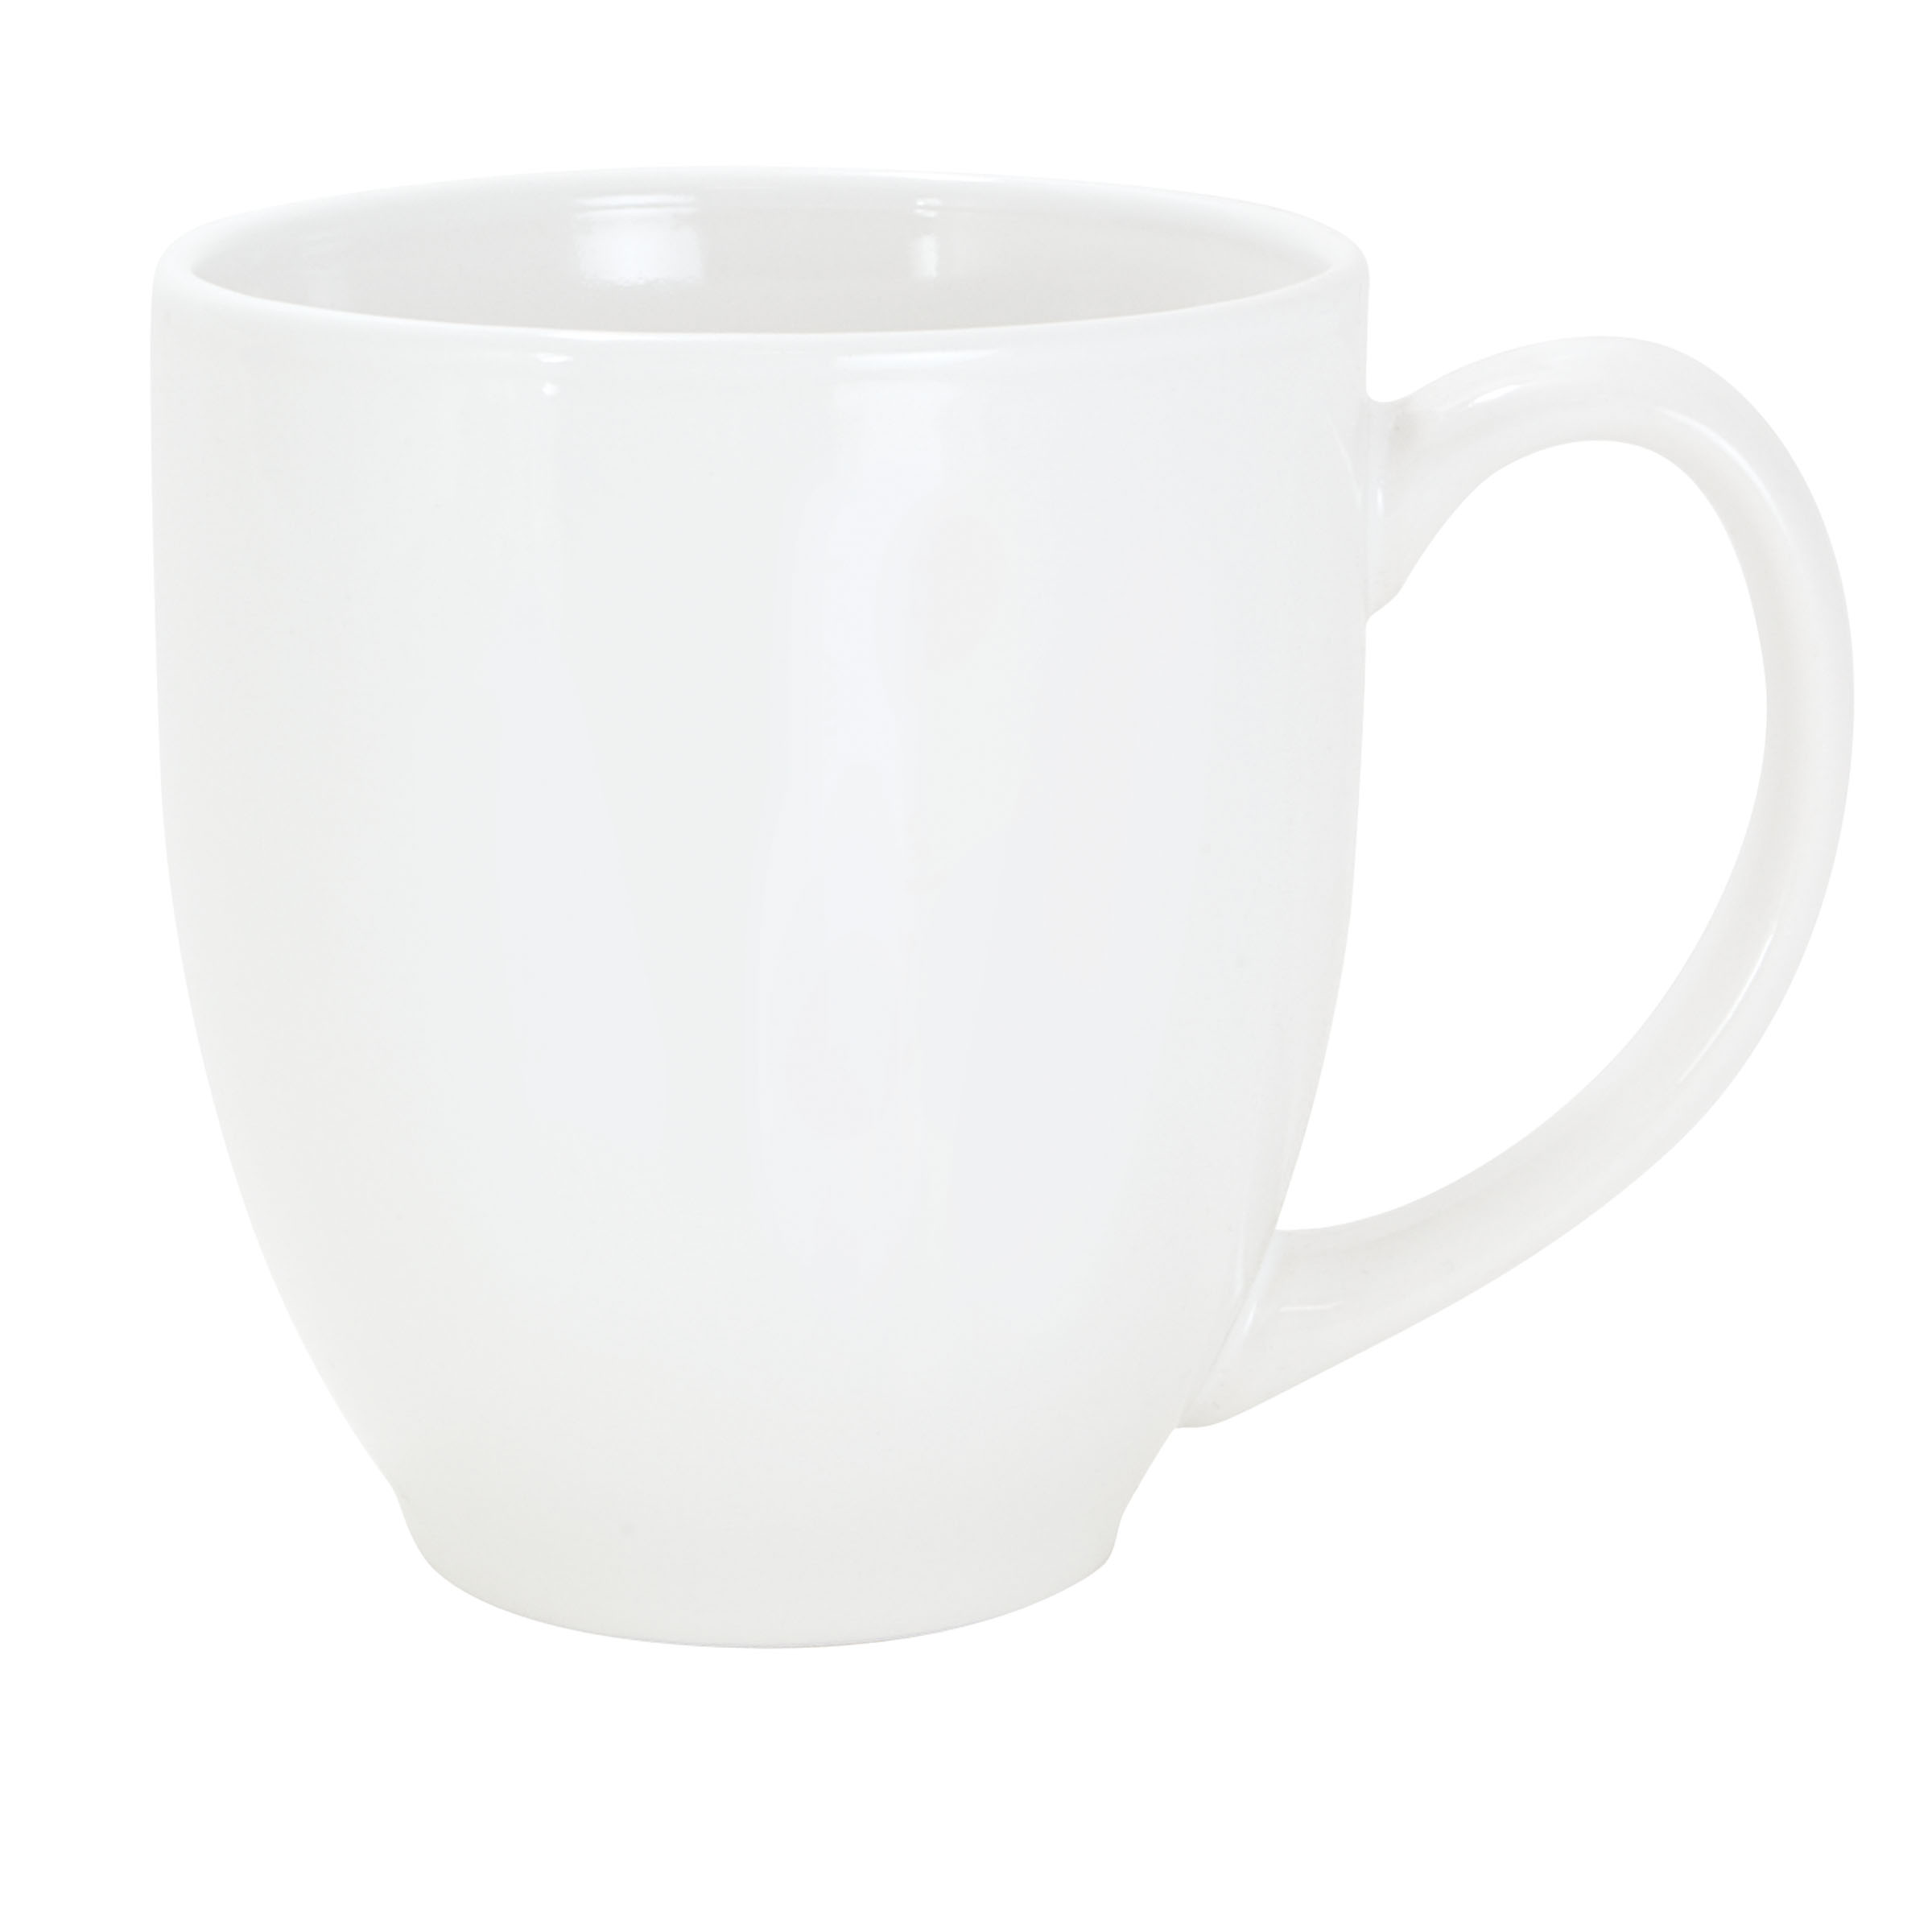 Numo Solid Color Bistro Mug 16 Ounce White Ceramic